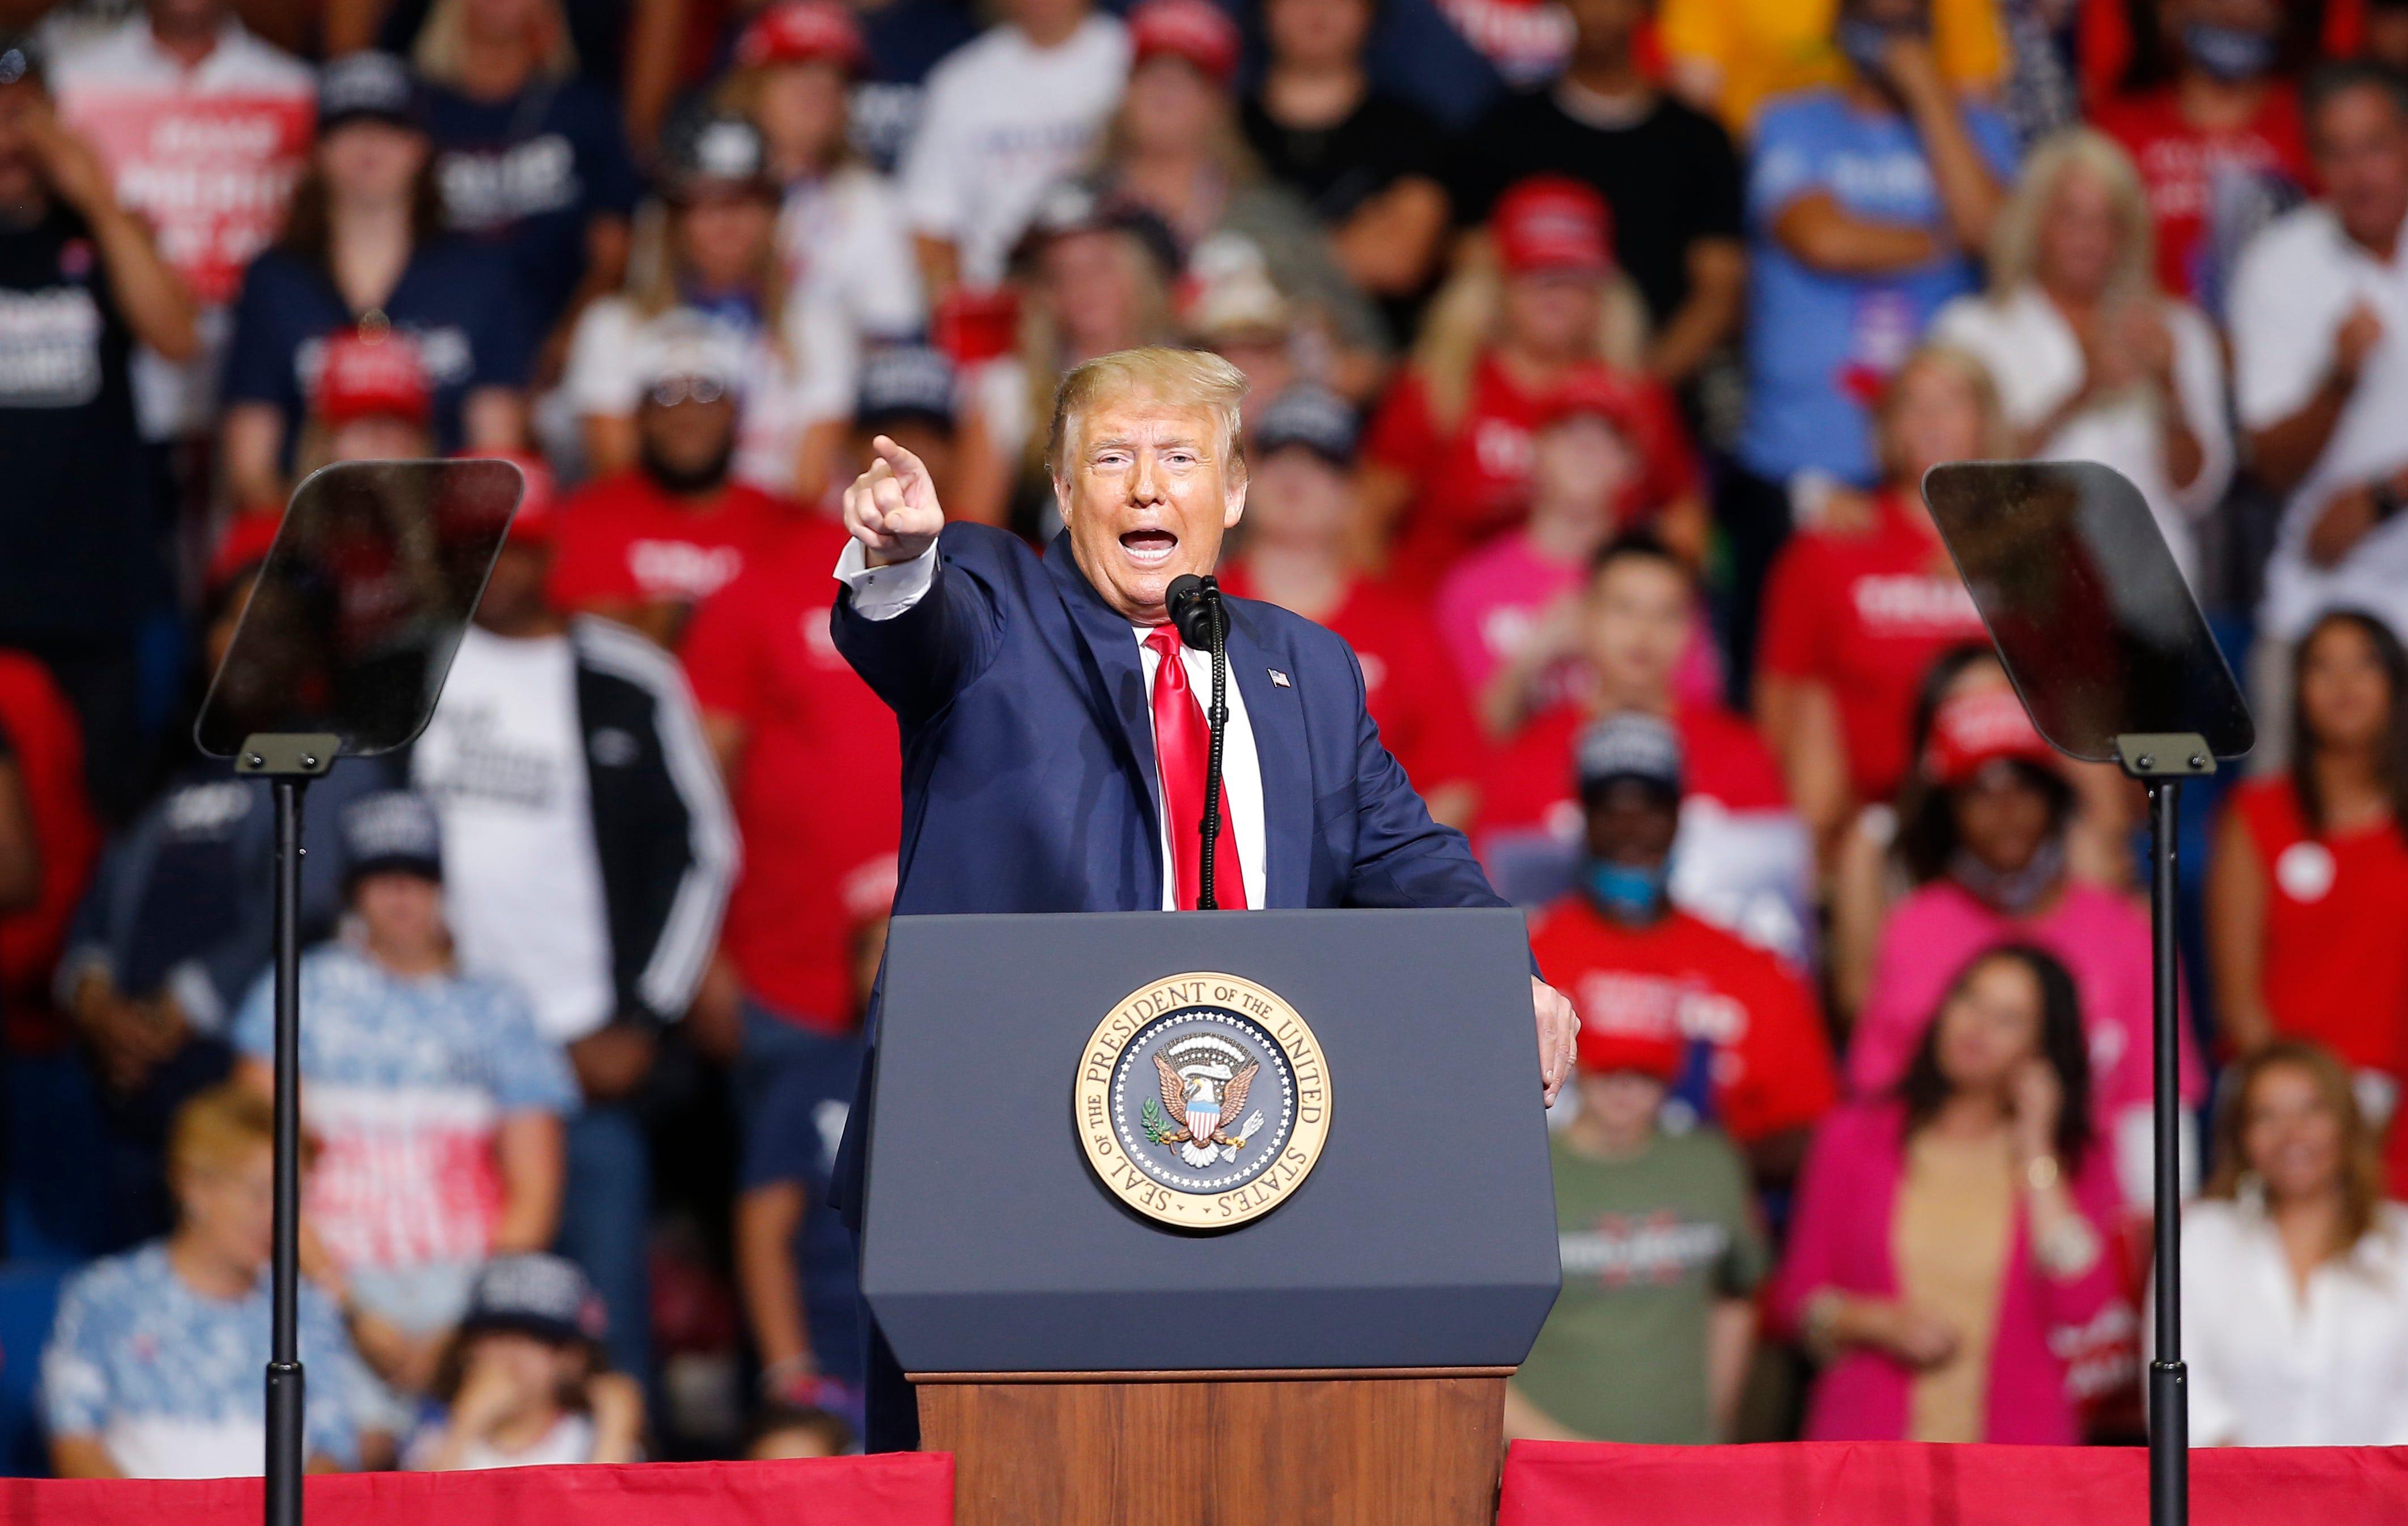 Trump Tulsa speech ends, president said he wanted to  slow the testing down  on coronavirus